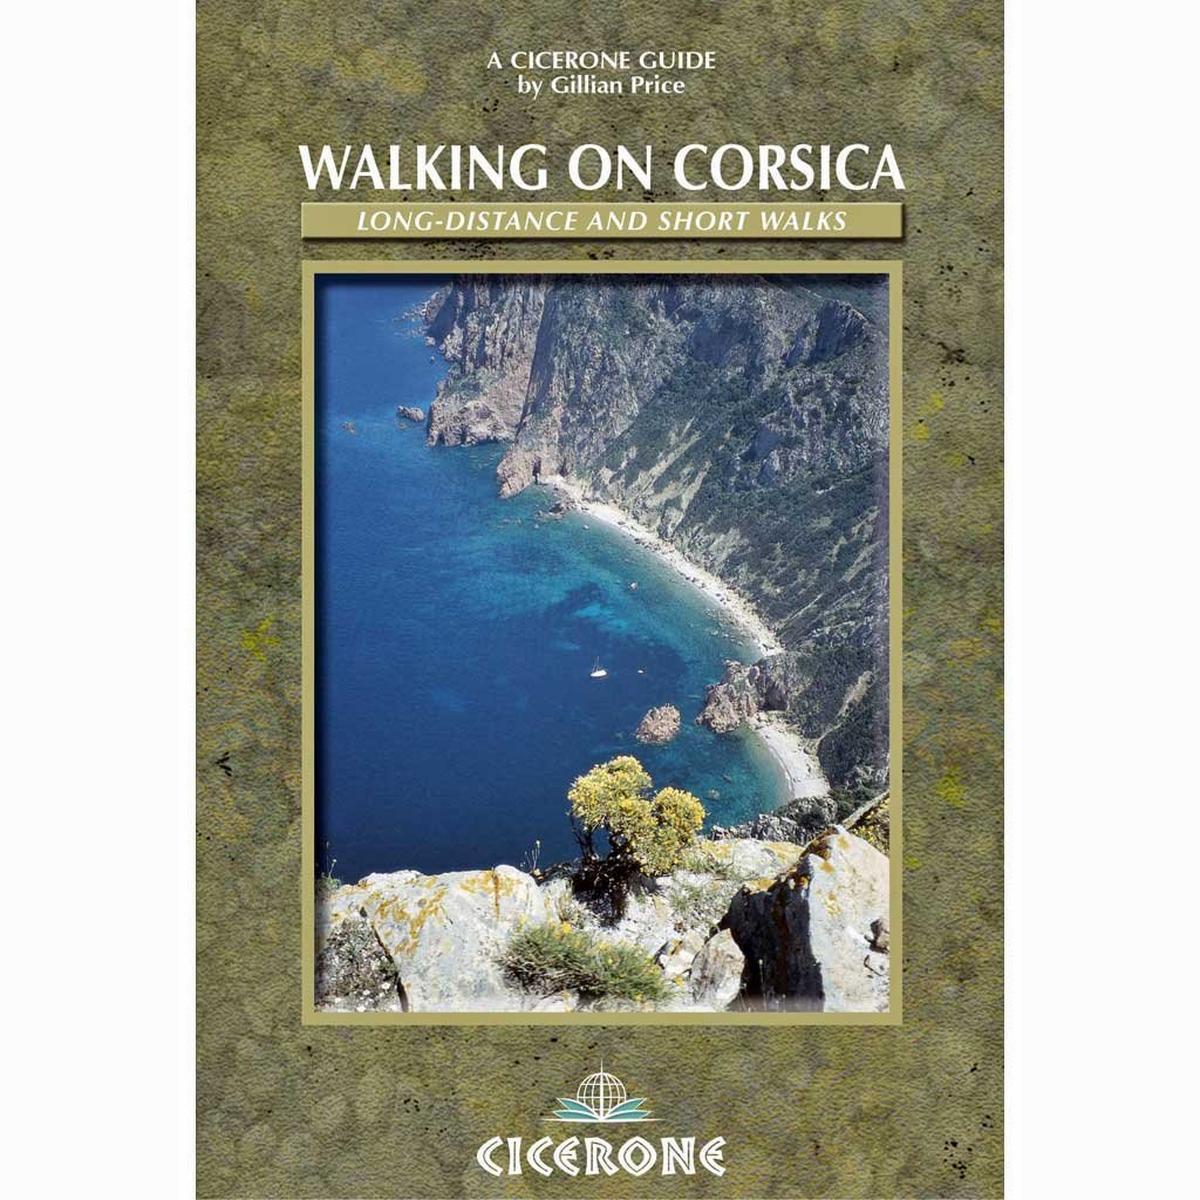 Cicerone Guide Book: Walking in Corsica